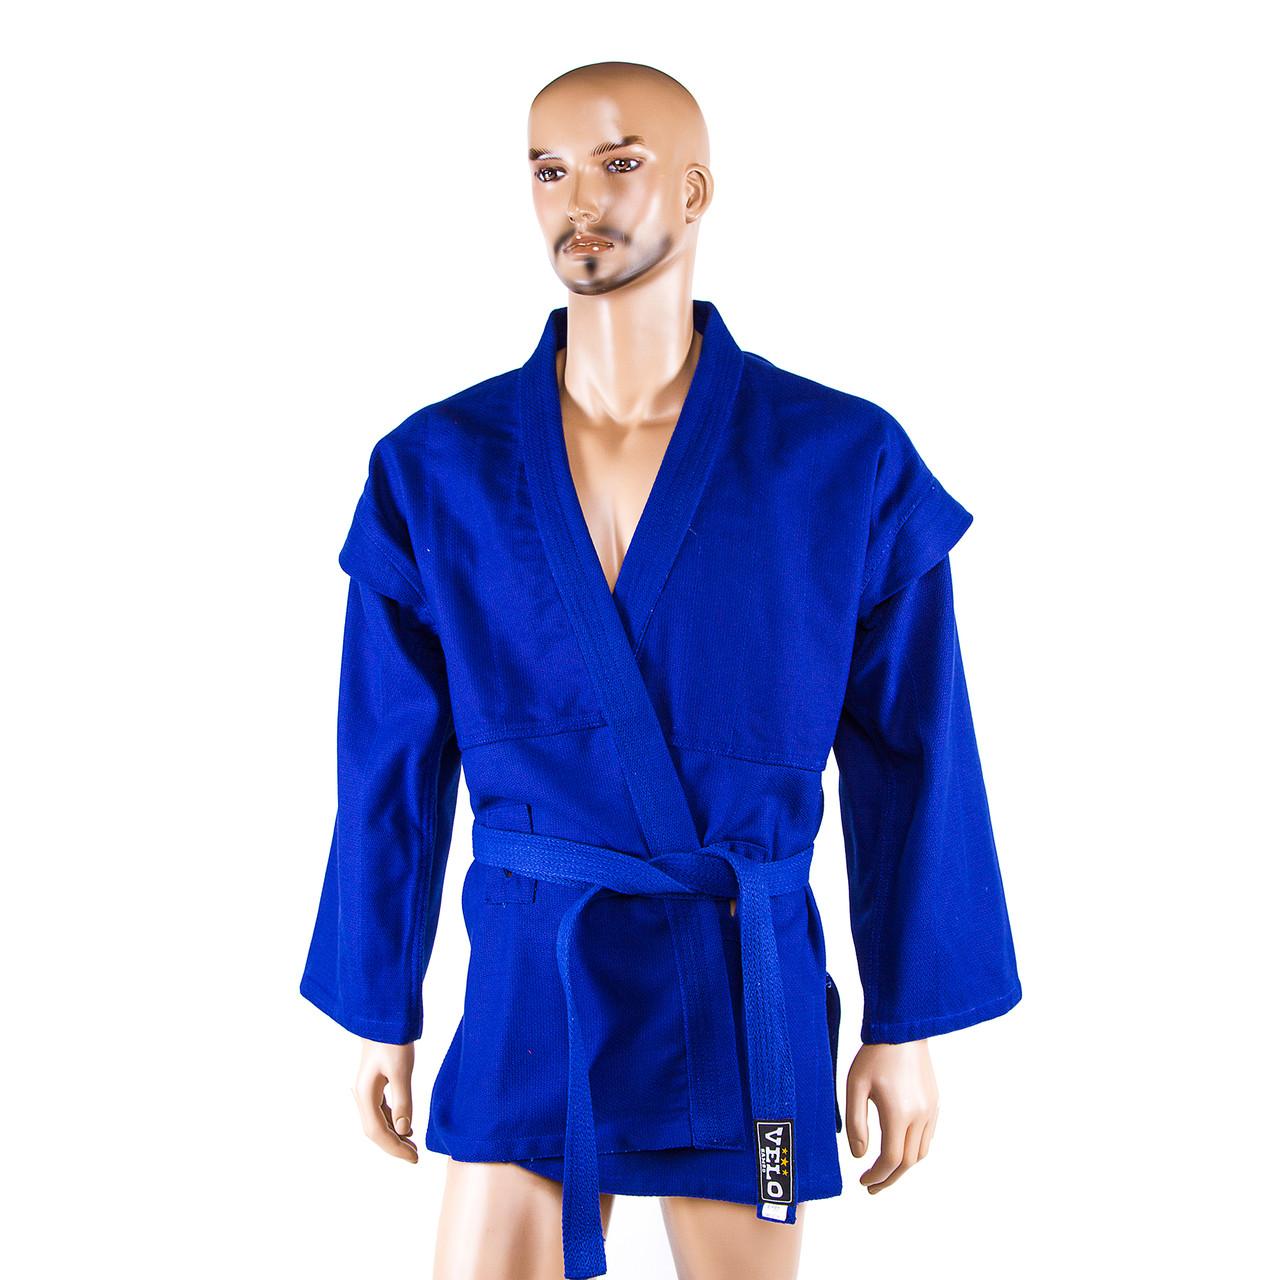 Самбовка, куртка+шорты(эластан), синий, рост 190